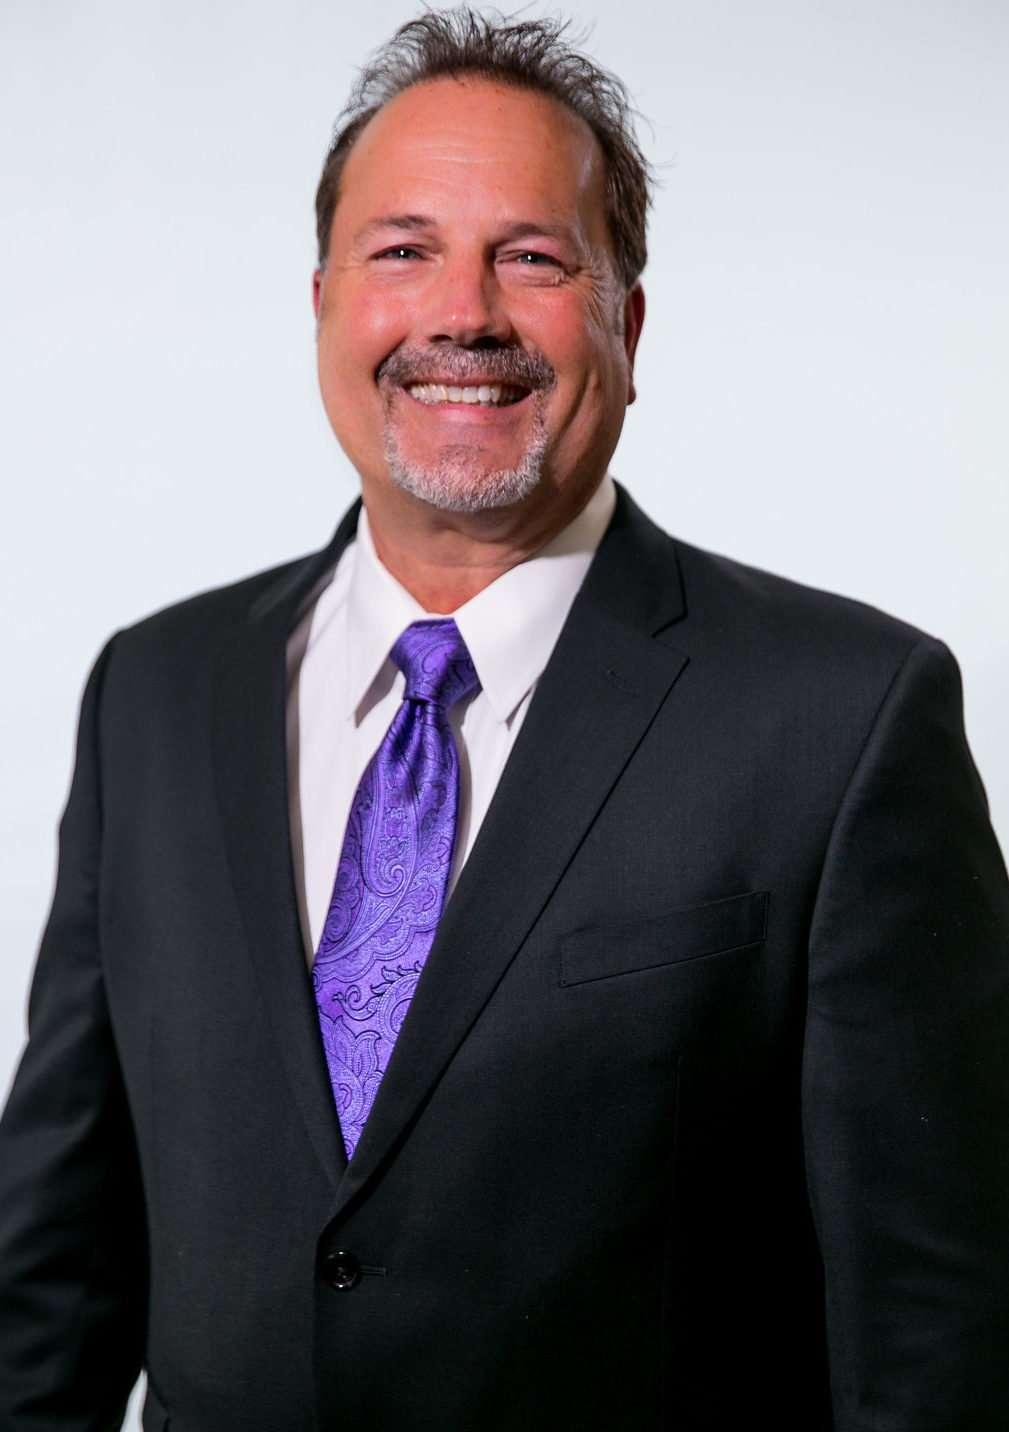 Dwayne Beason, Chief Executive Officer